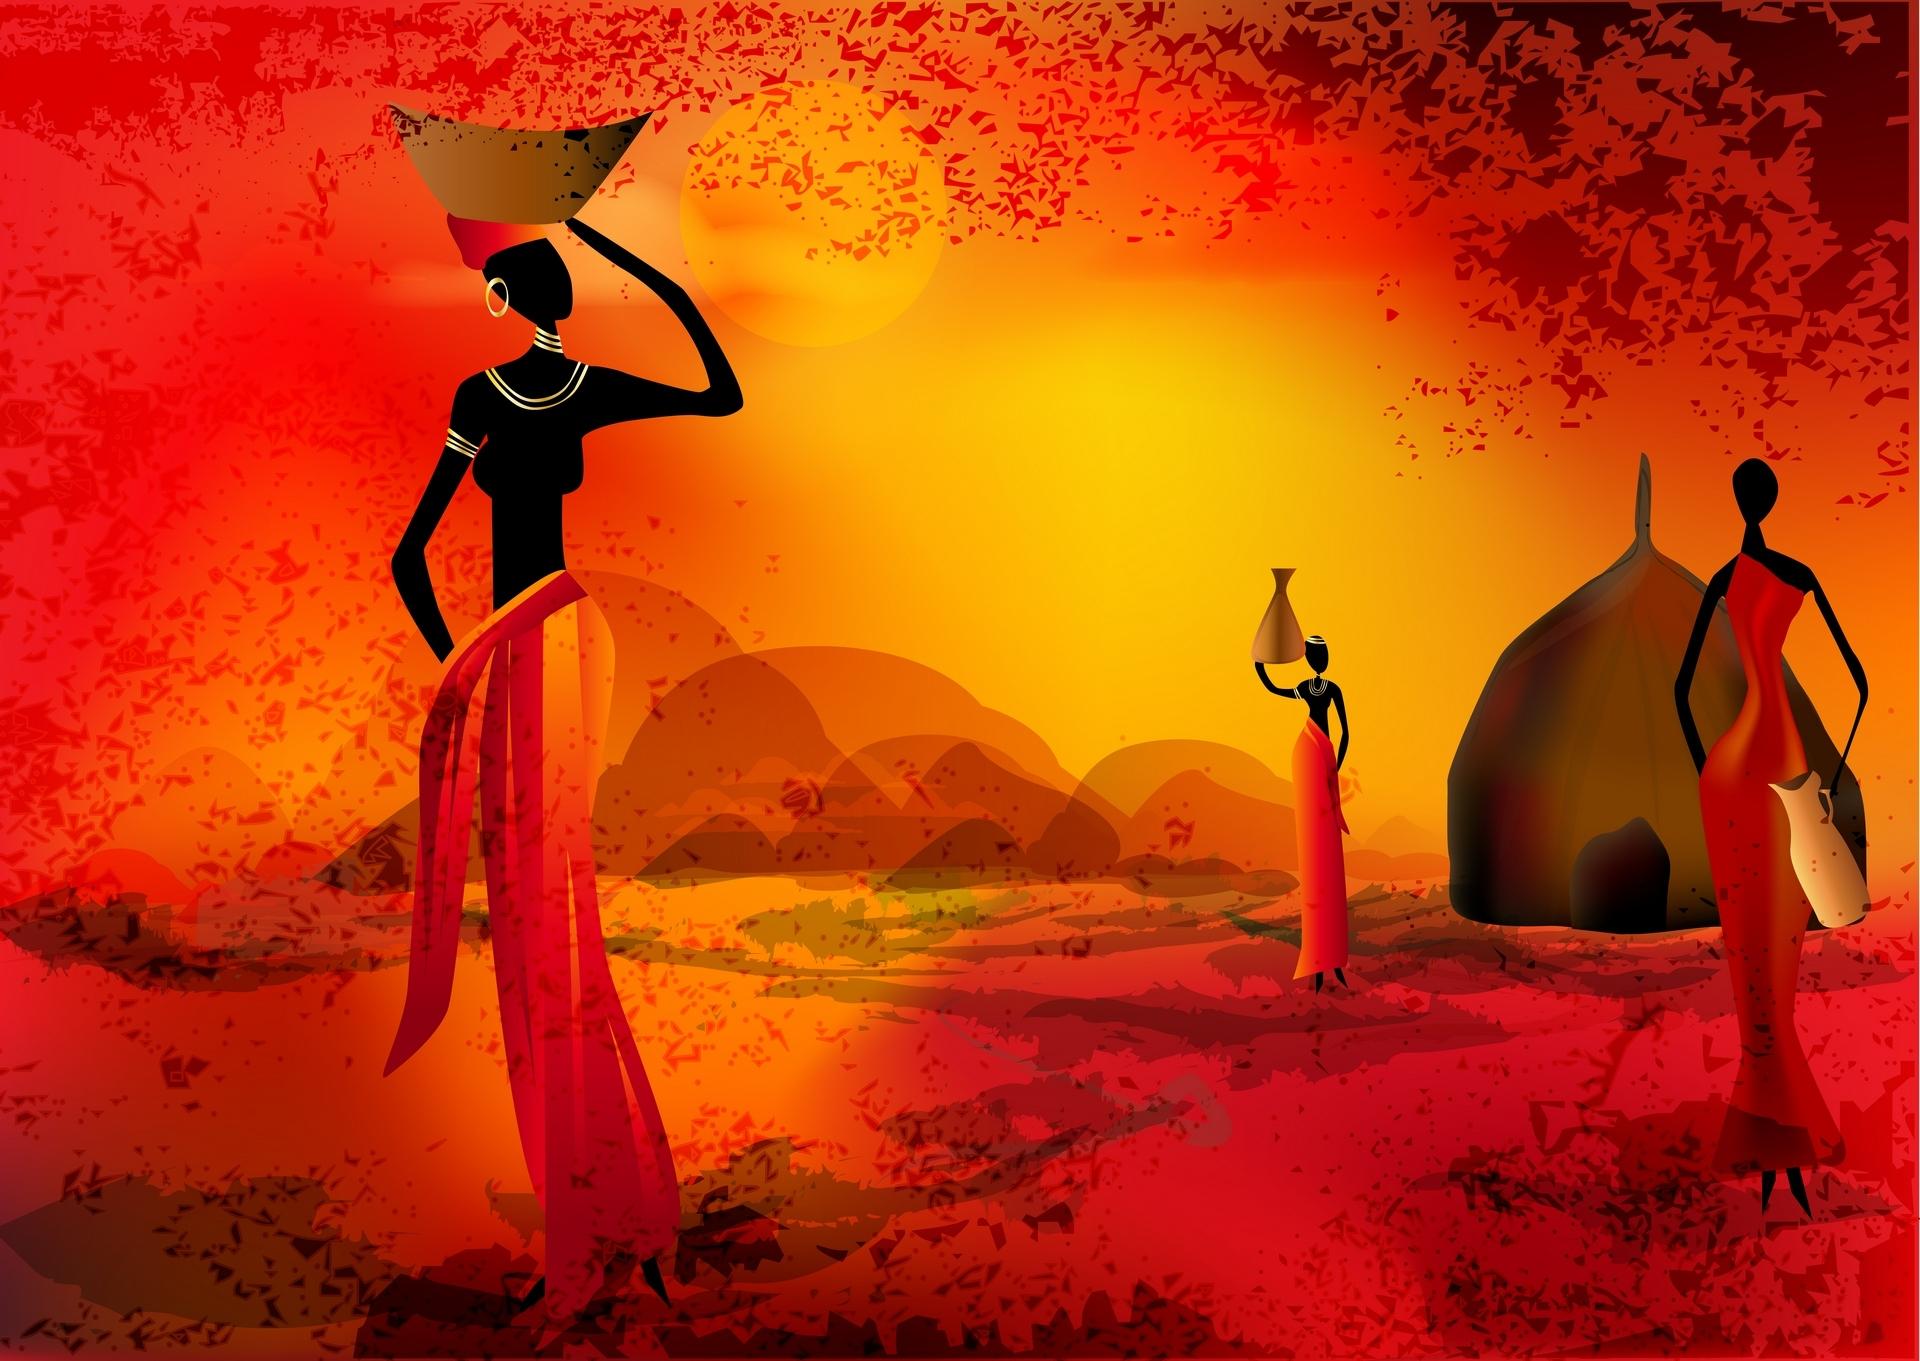 картинки африка мотивы давно помним великолепному